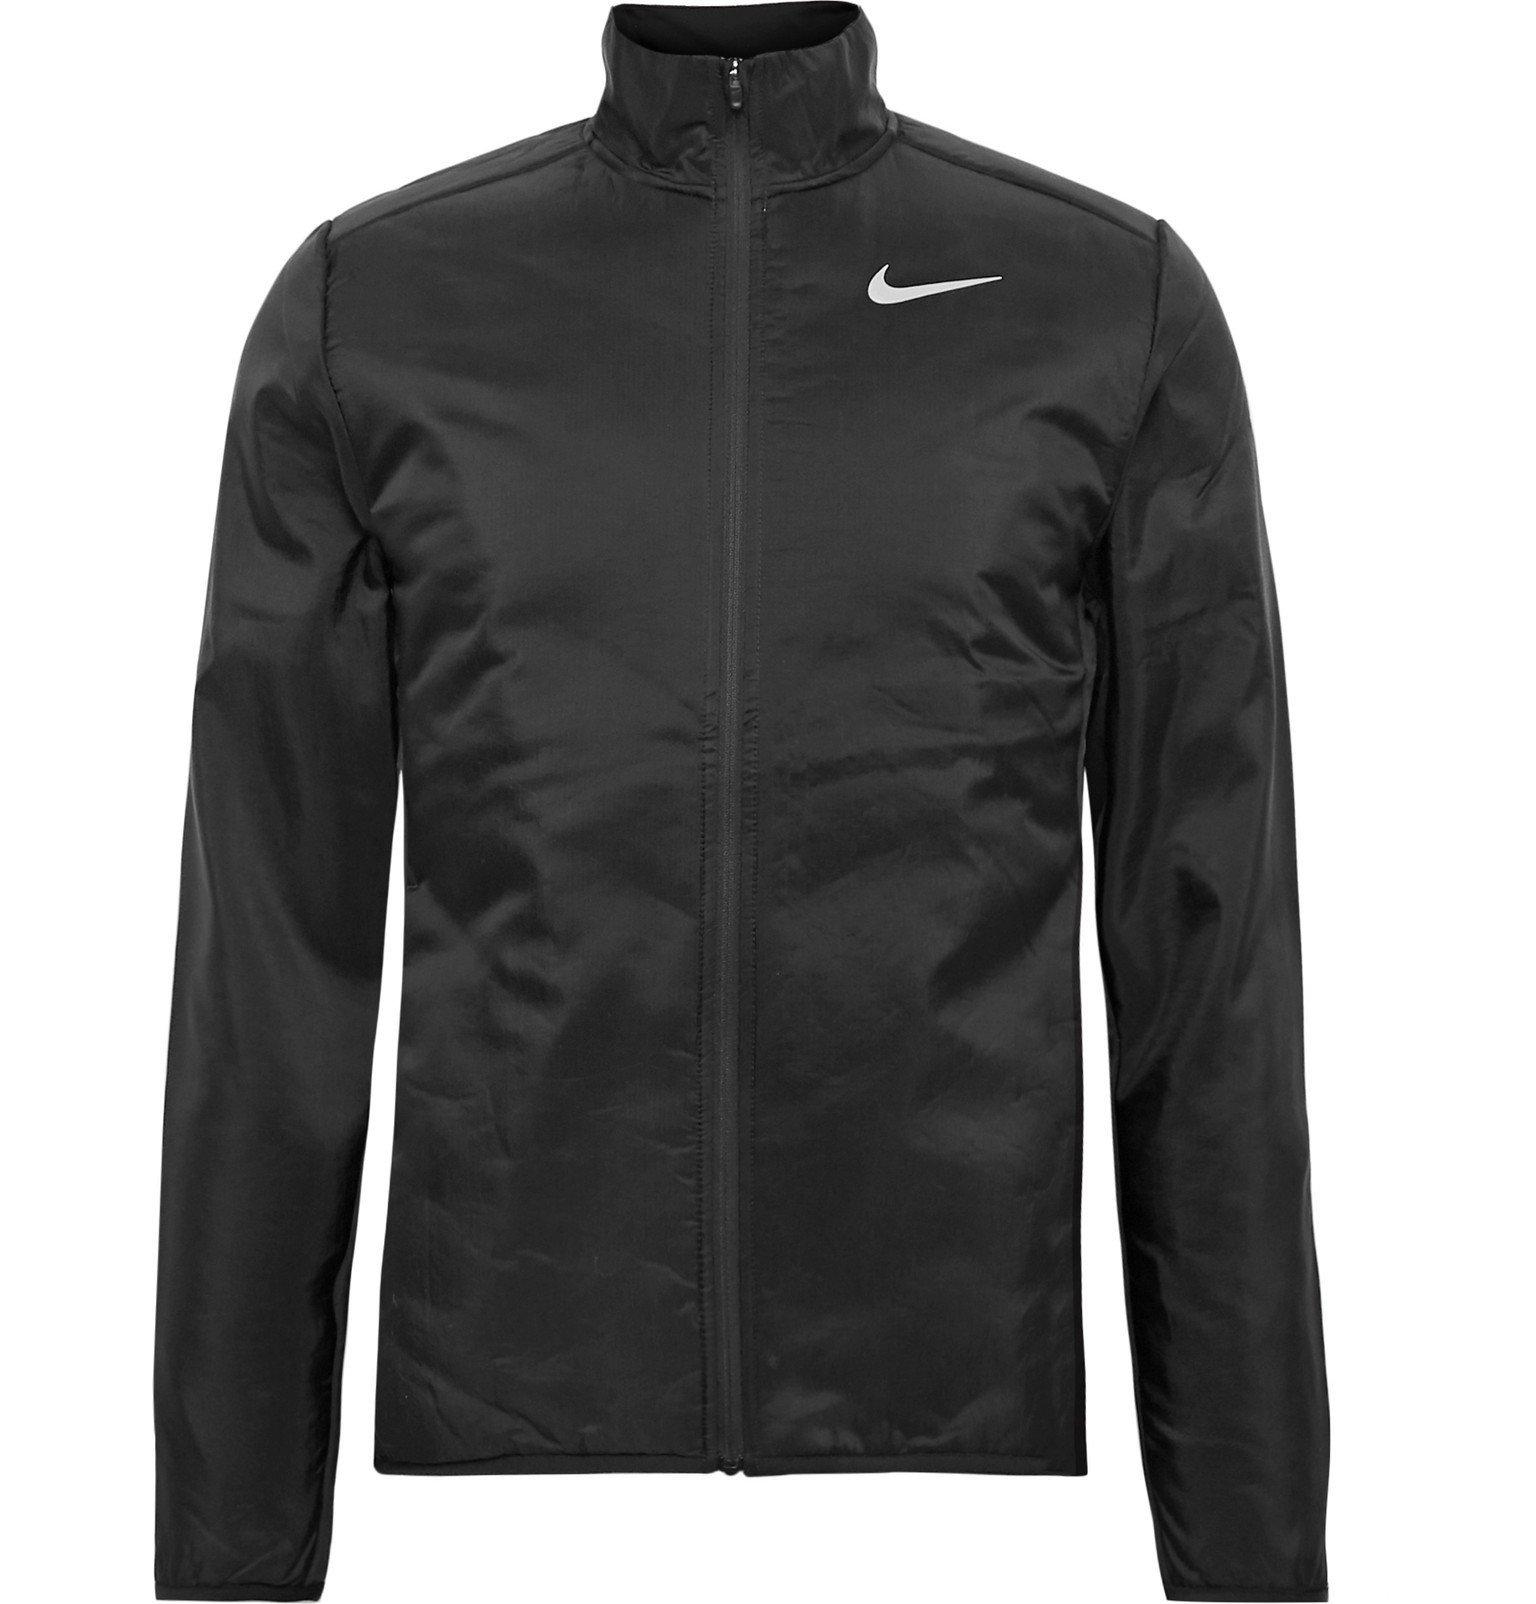 Nike Running - AeroLayer Nylon-Ripstop Padded Jacket - Black